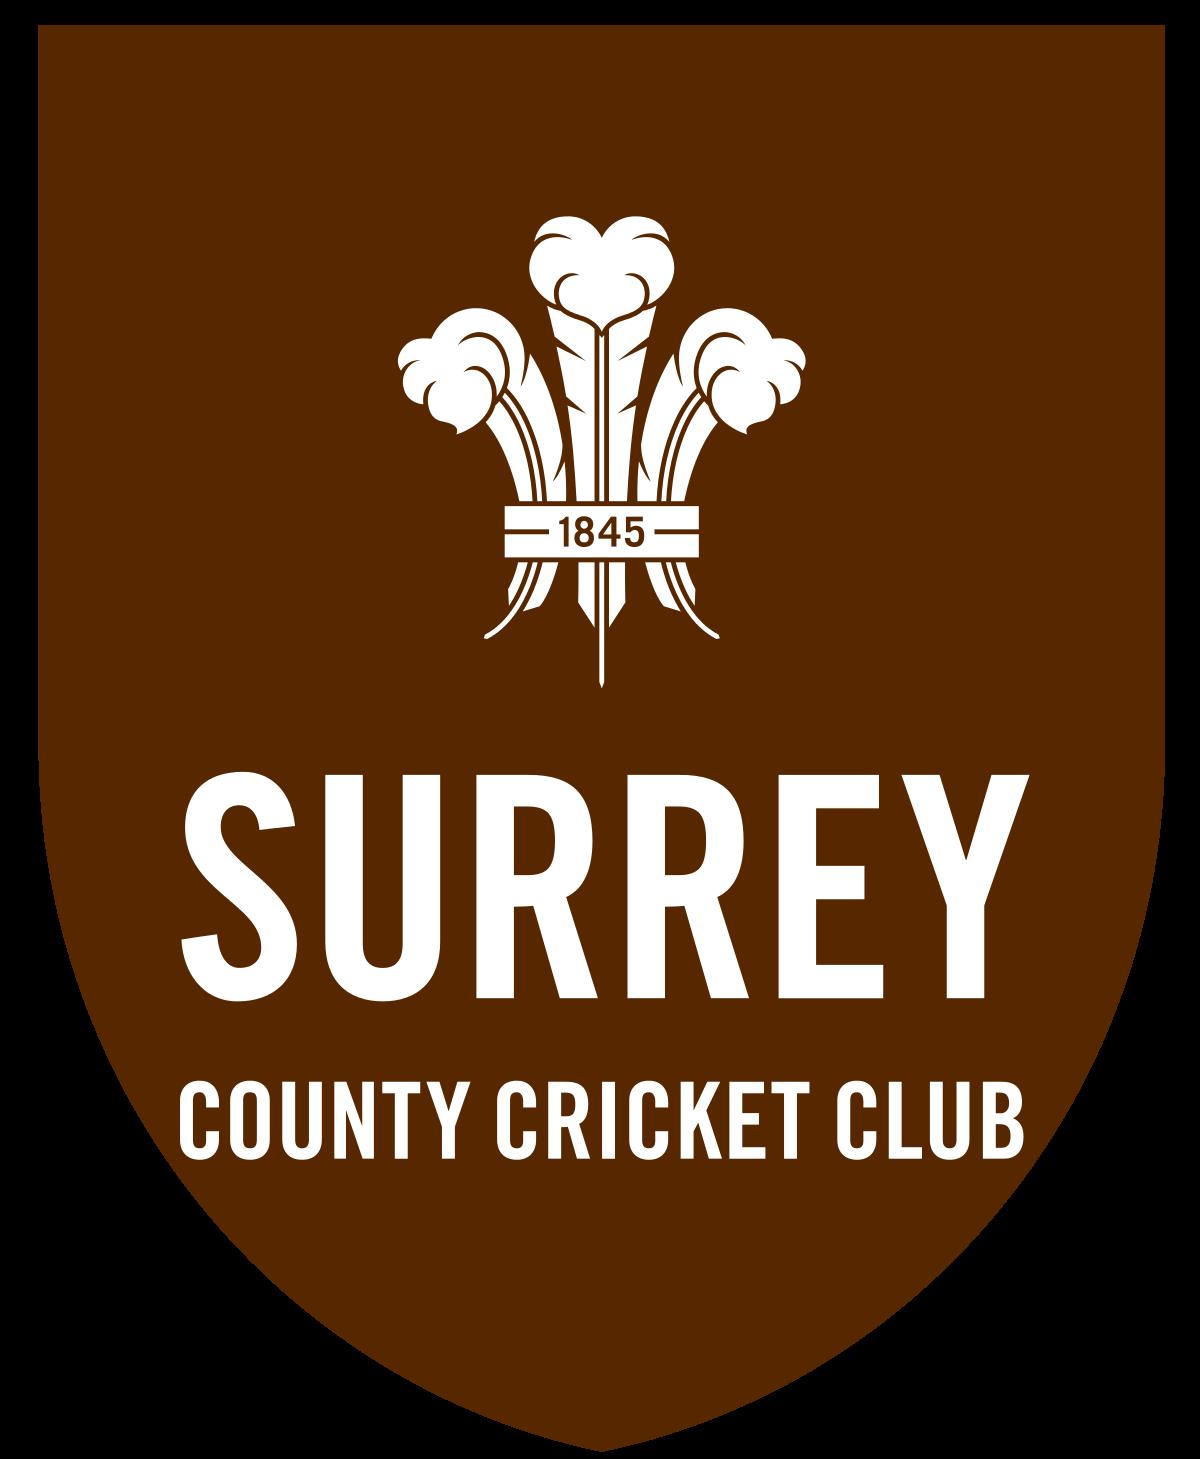 Surrey CCC's logo